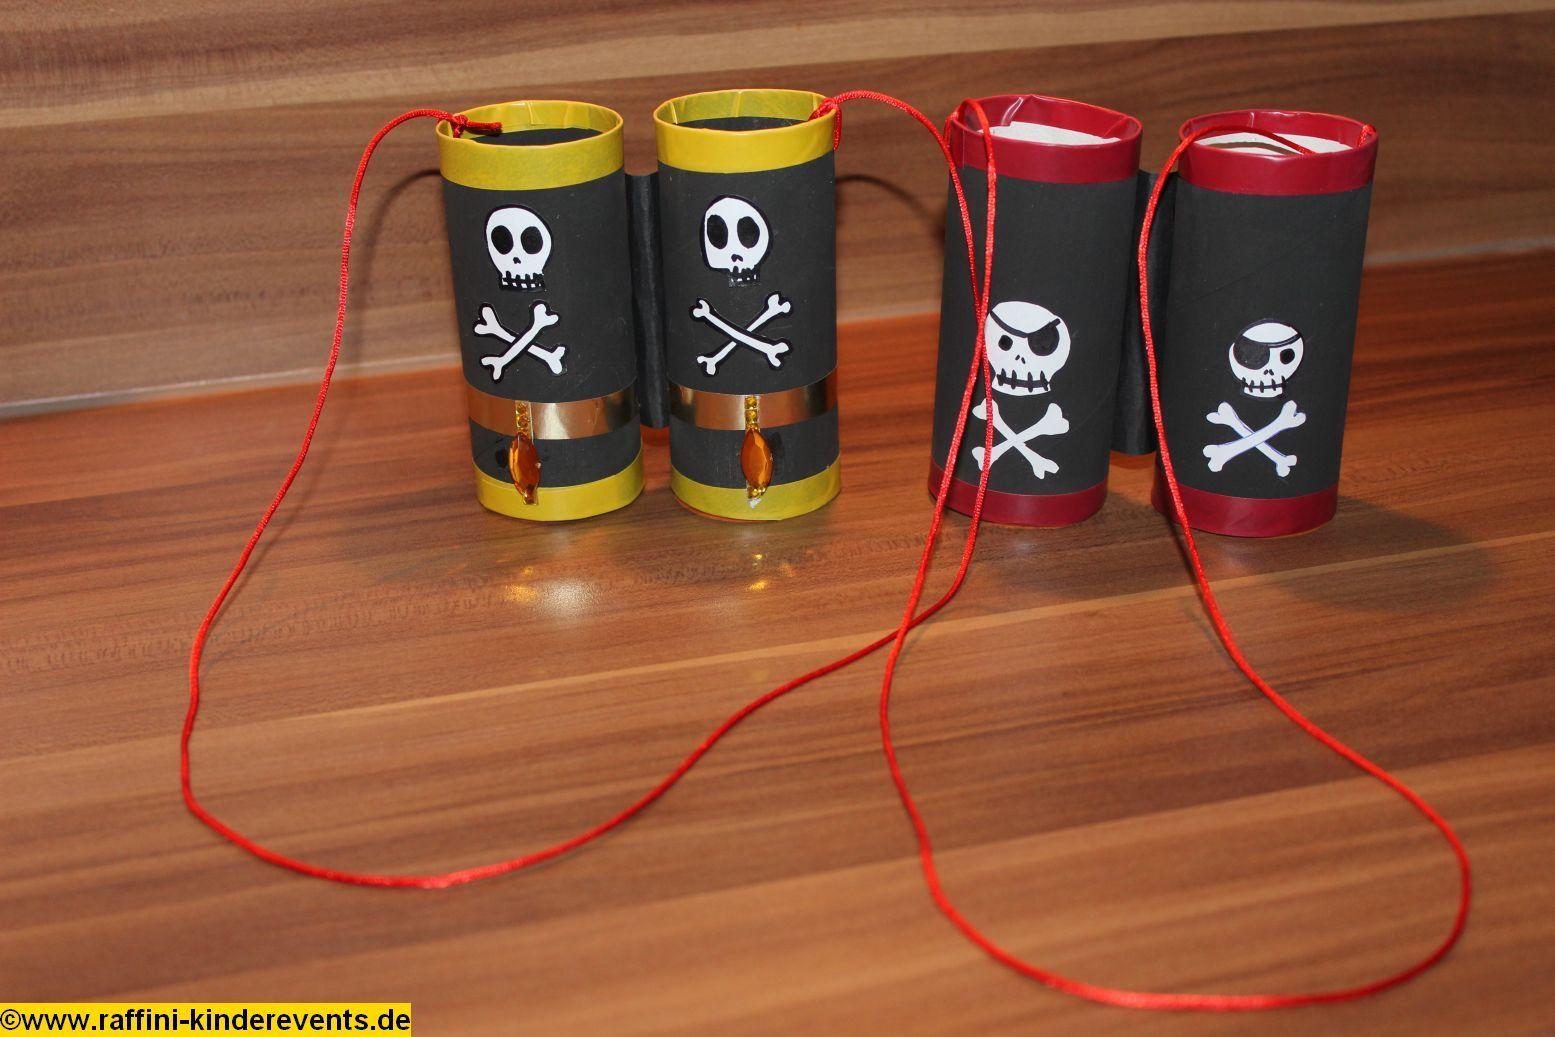 Recycling Basteln - Piratenparty, Kindergeburtstag 126                                                                                                                                                     Mehr #recyclingbasteln